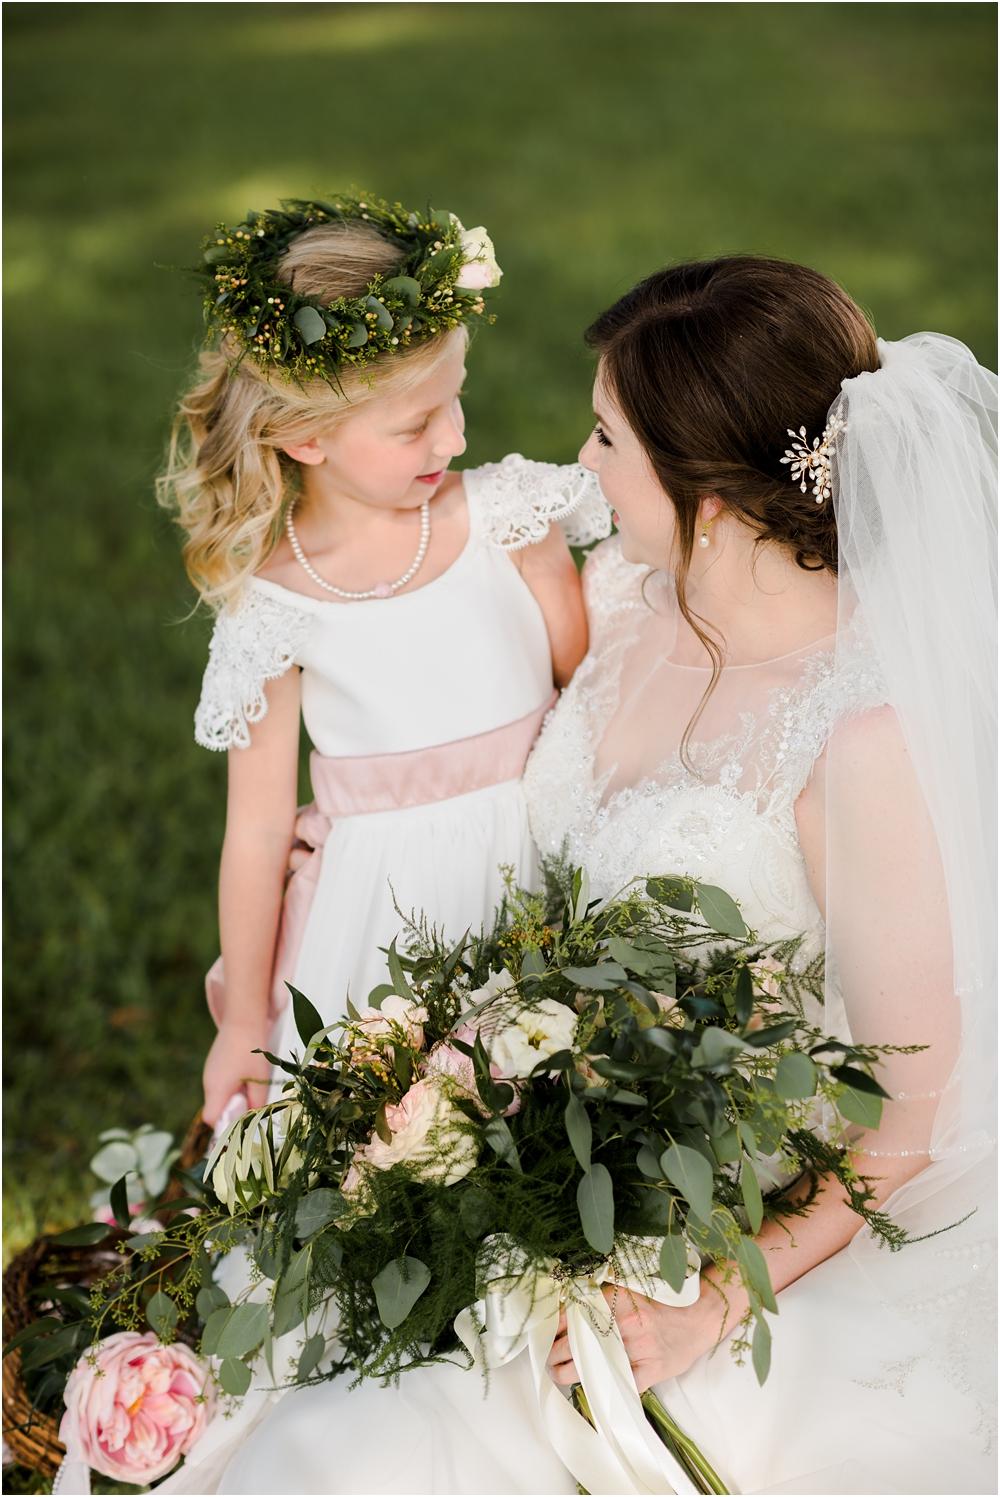 marianna-florida-wedding-photographer-kiersten-grant-86.jpg